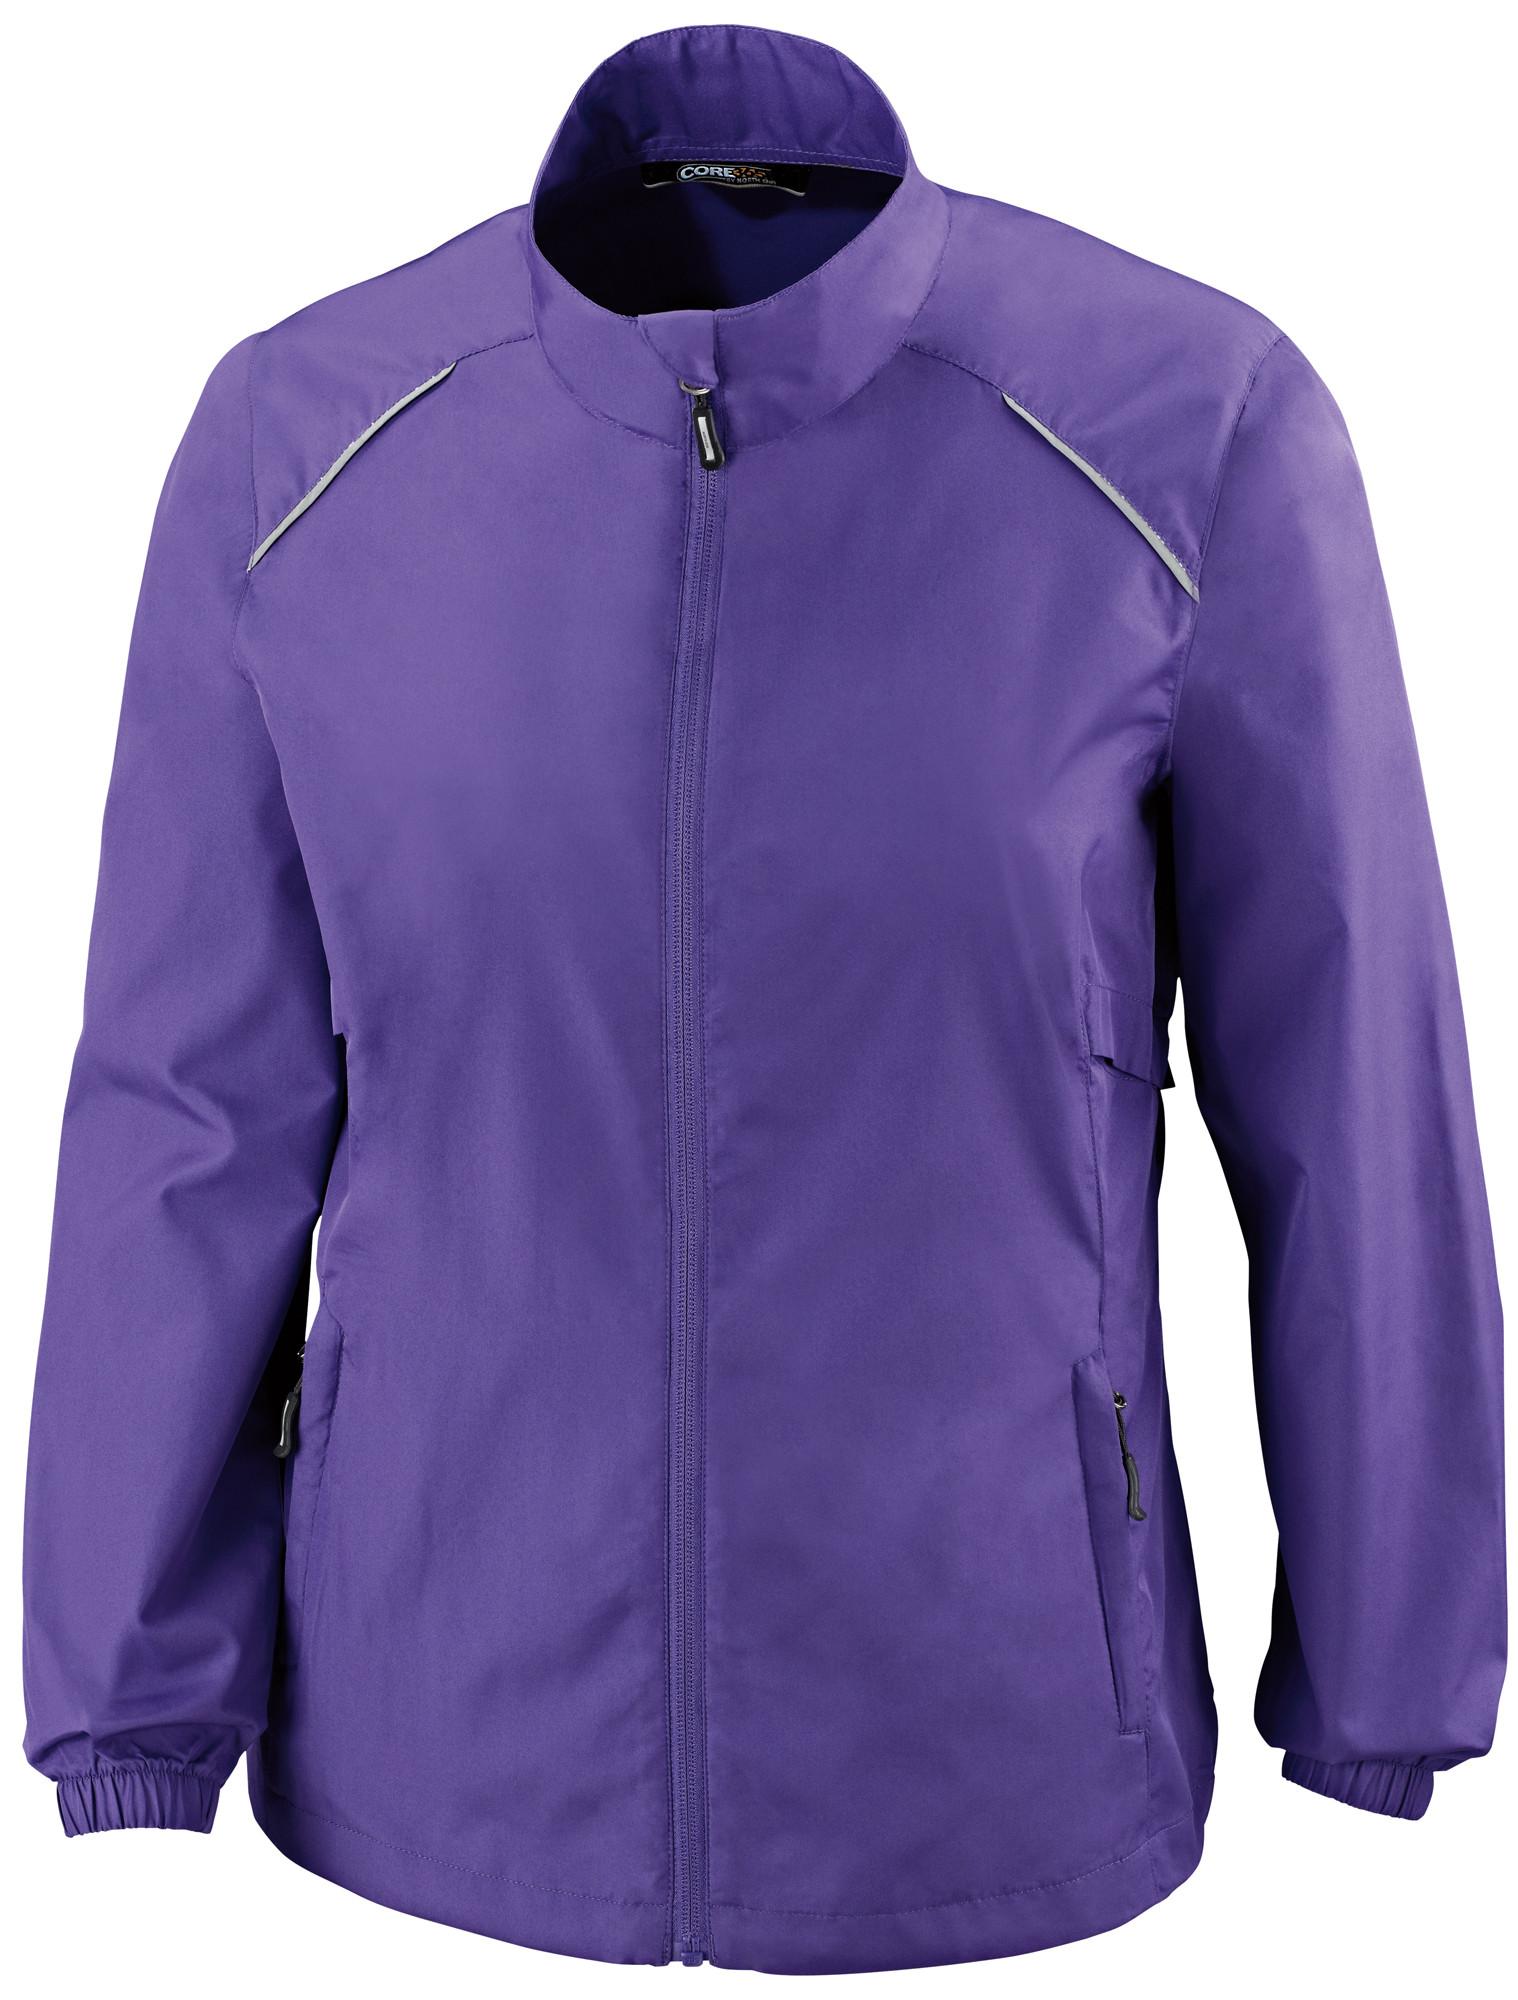 Ash City Core365 78183 - Motivate Core365 Outwear Ladies' Unlined Lightweight Jacket